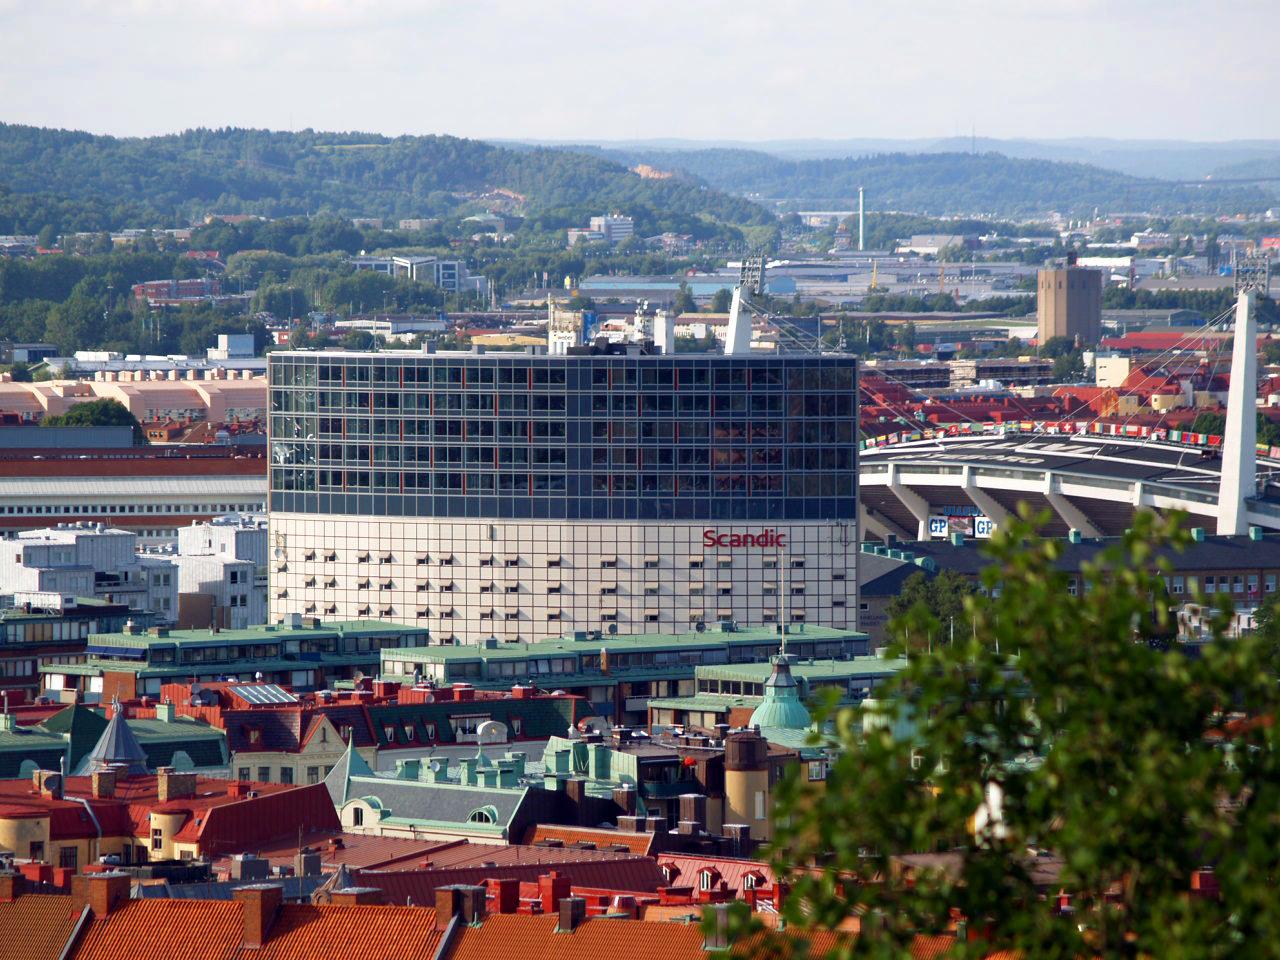 scandic hotell göteborg crown